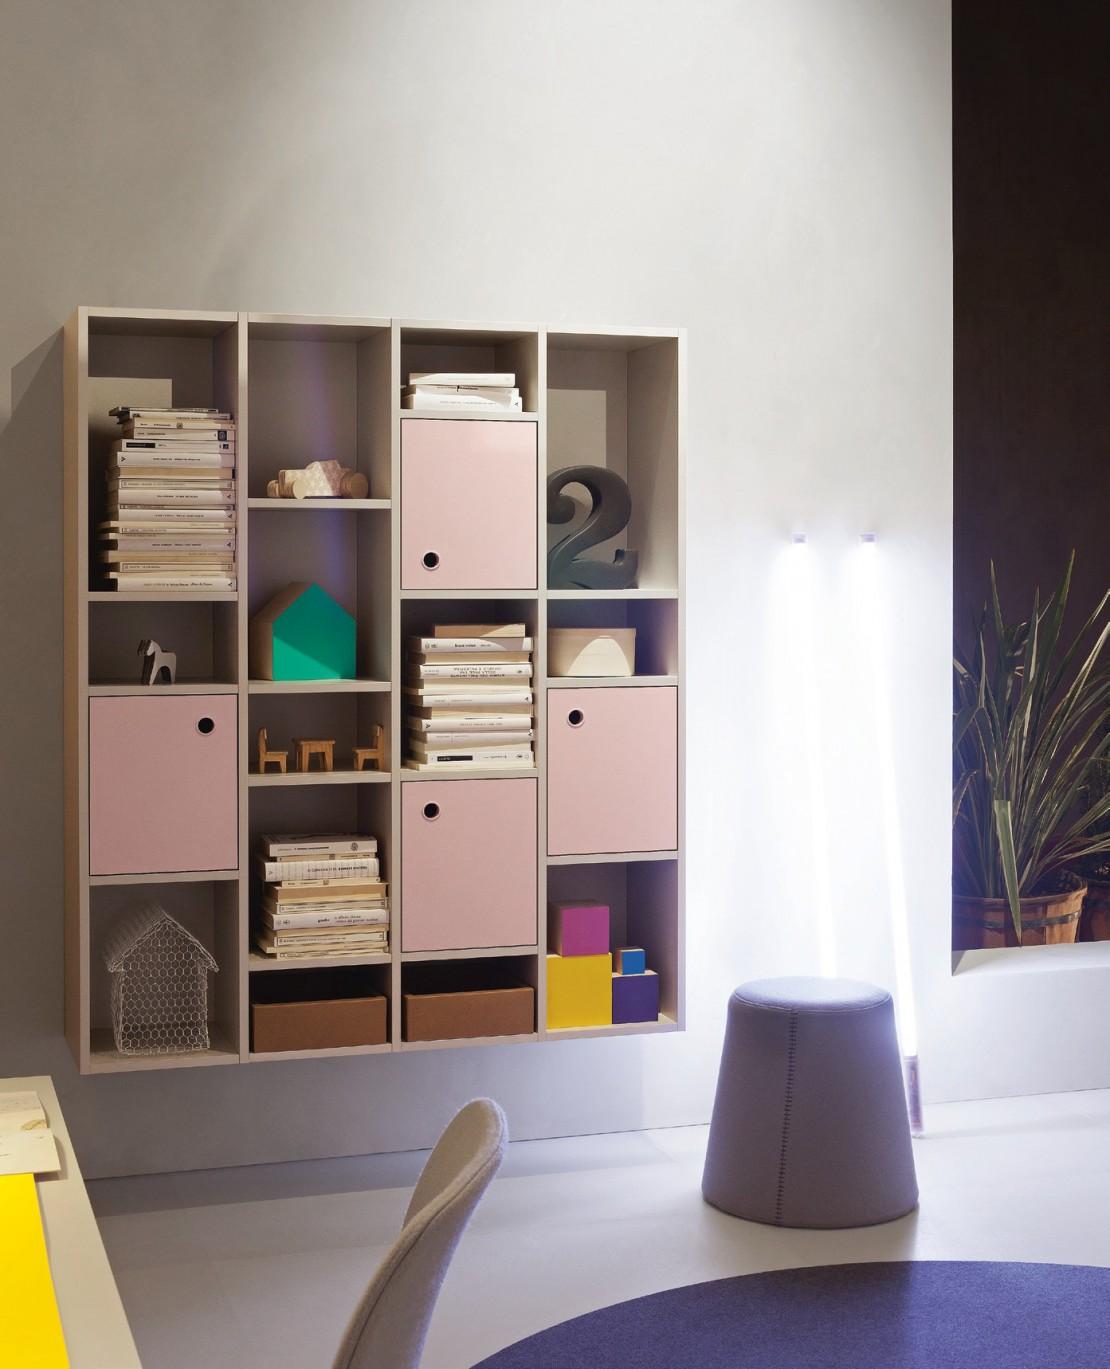 Lux libreria modulare pensile - Belvì Camerette Torino